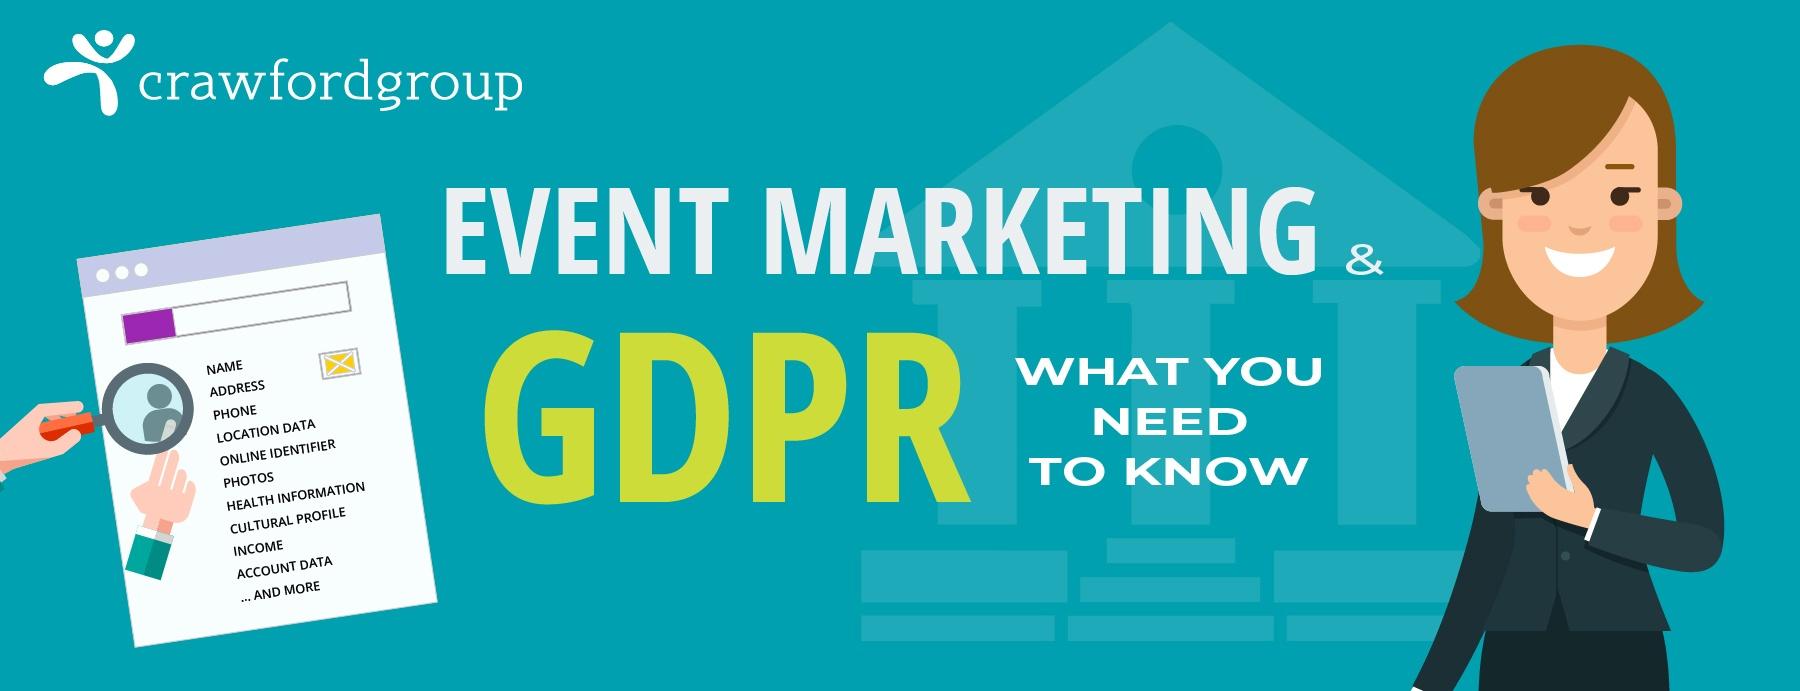 event-marketing-gdpr_infographic_gdpr banner